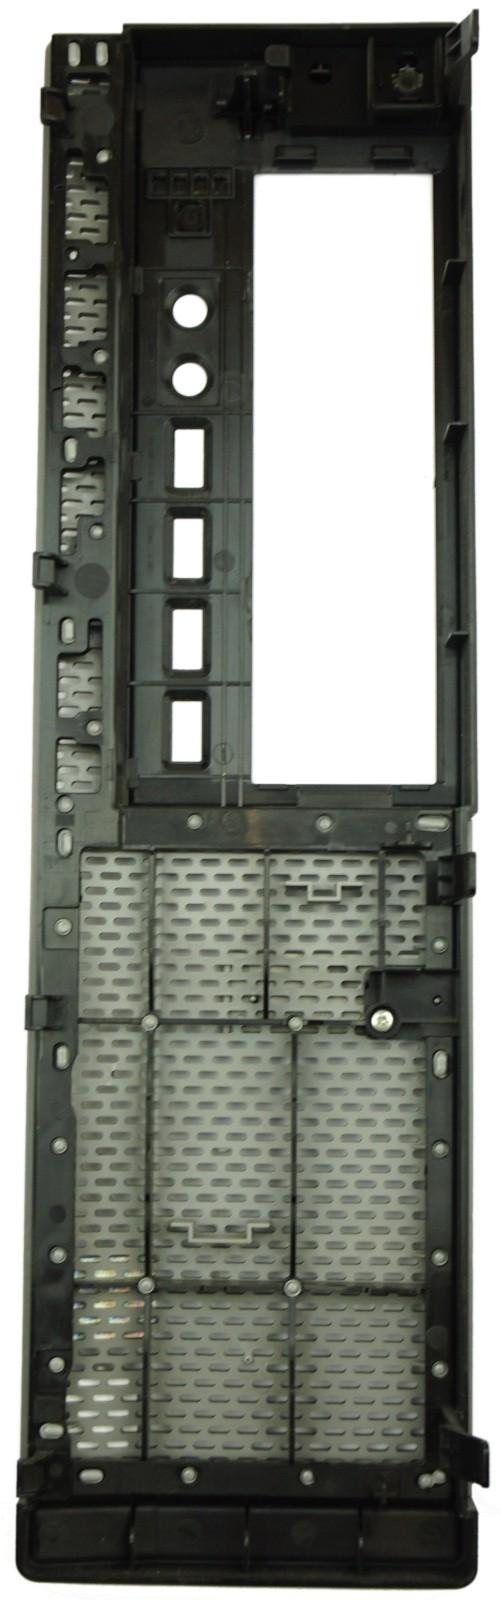 Dell Optiplex 790 SDT Front Bezel